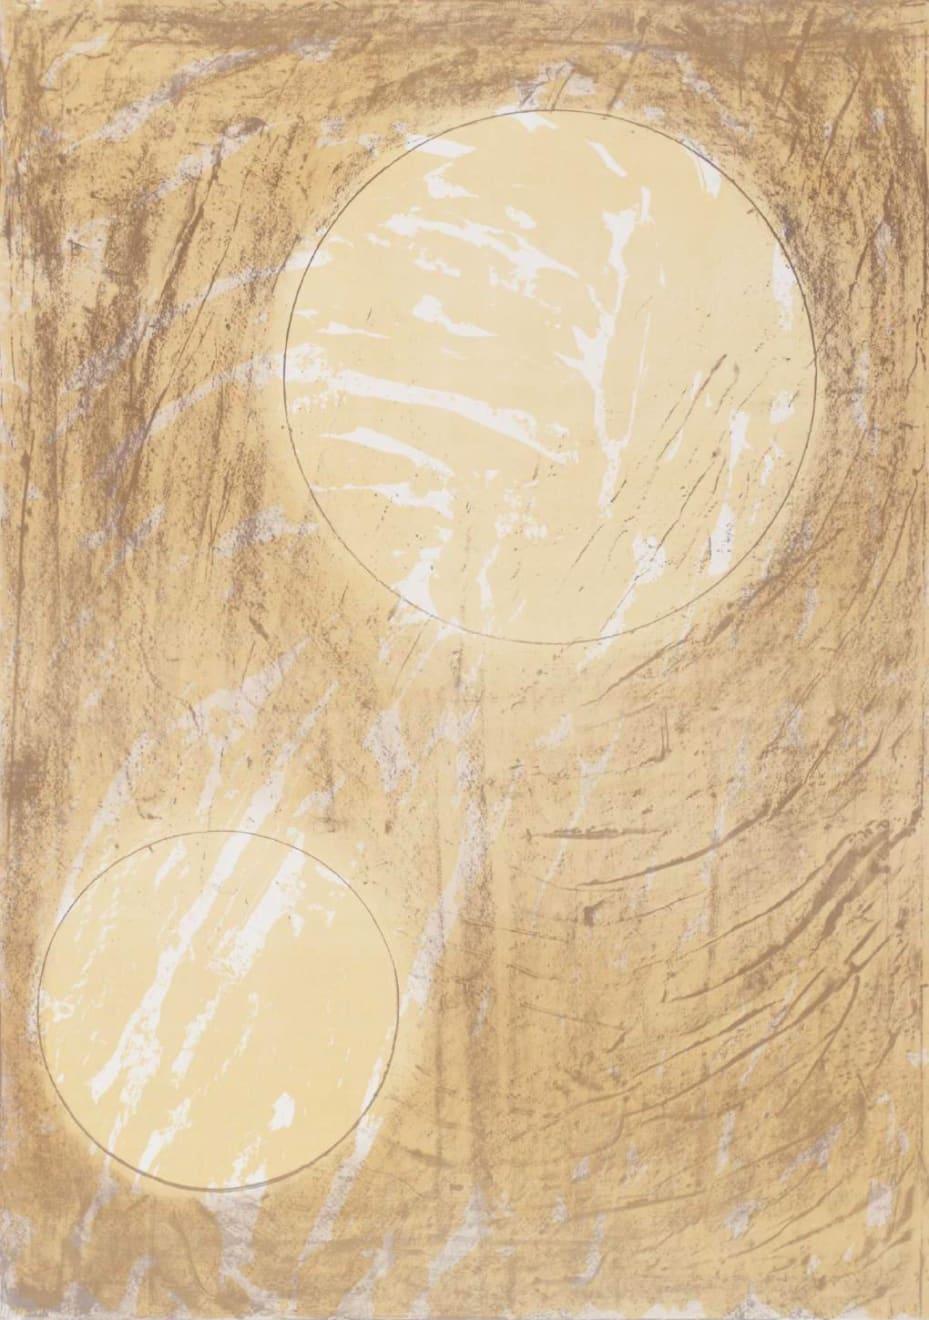 Barbara Hepworth, Sun and Water , 1971